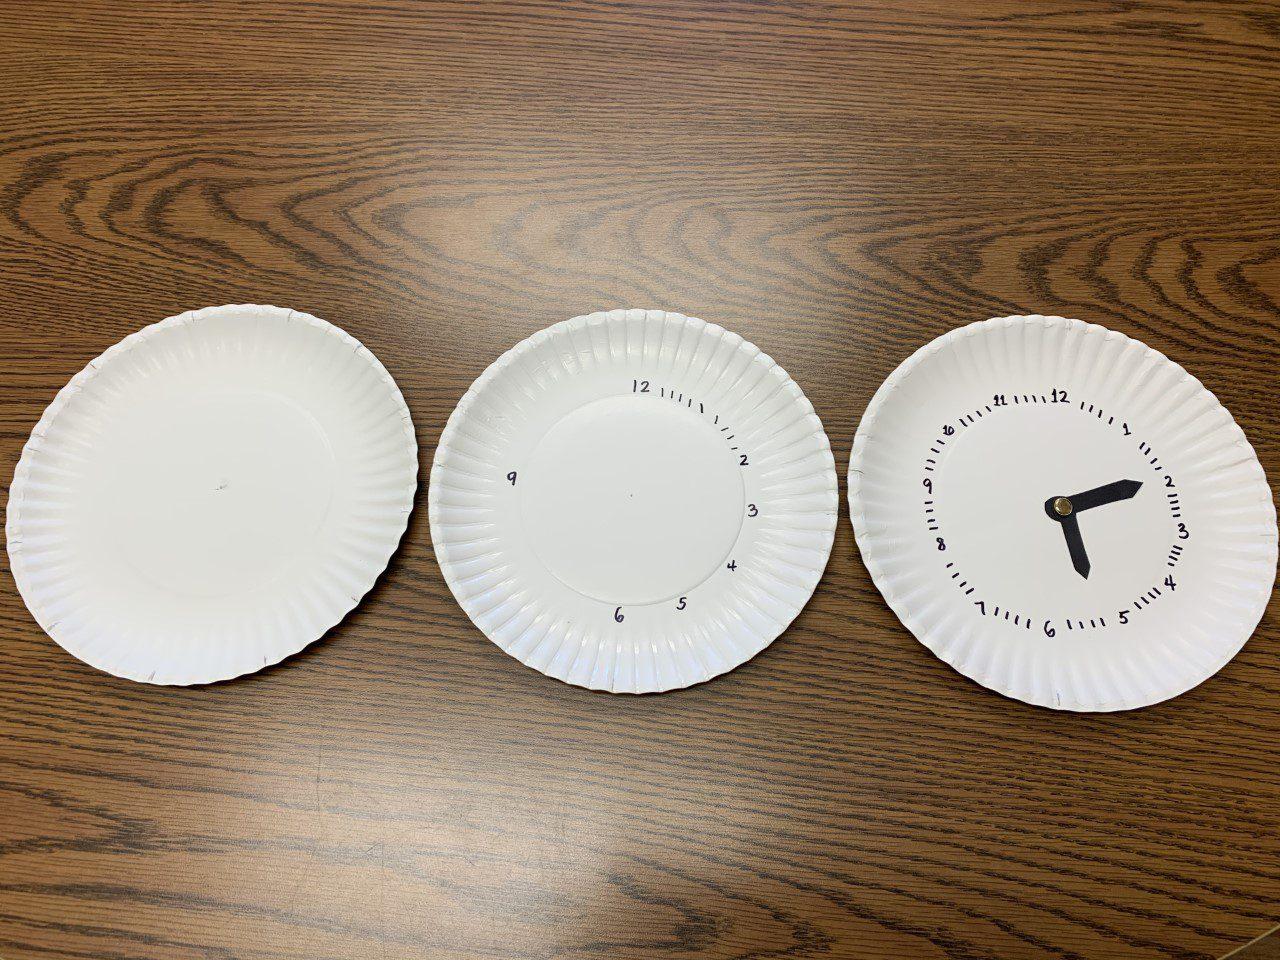 Learning & Loving It Clocks